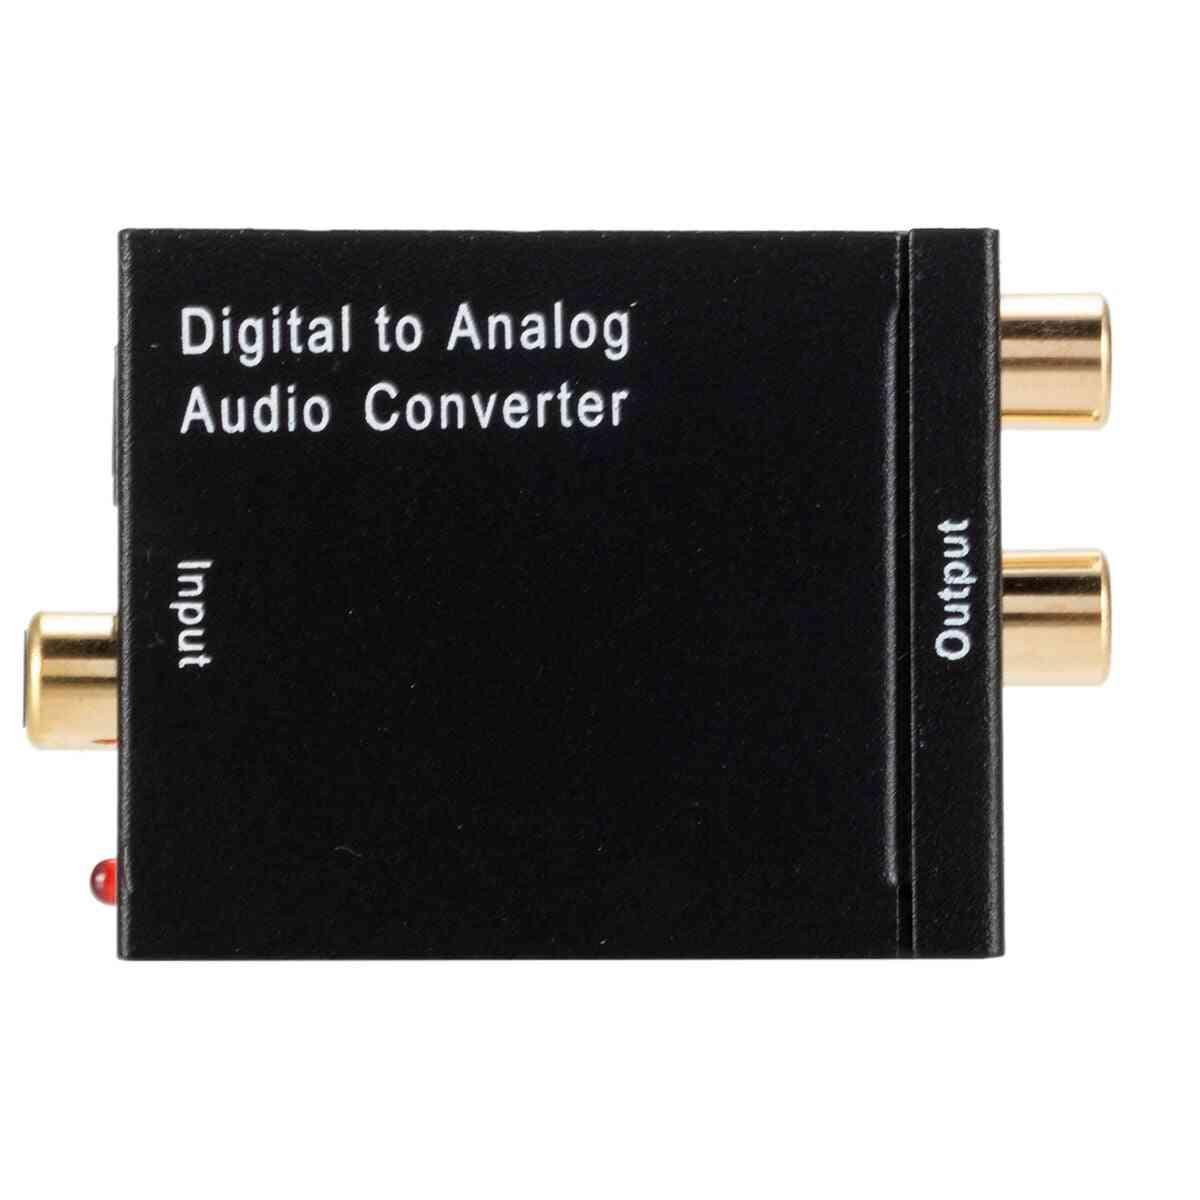 Dac Digital To Analog Audio Converter  (black)